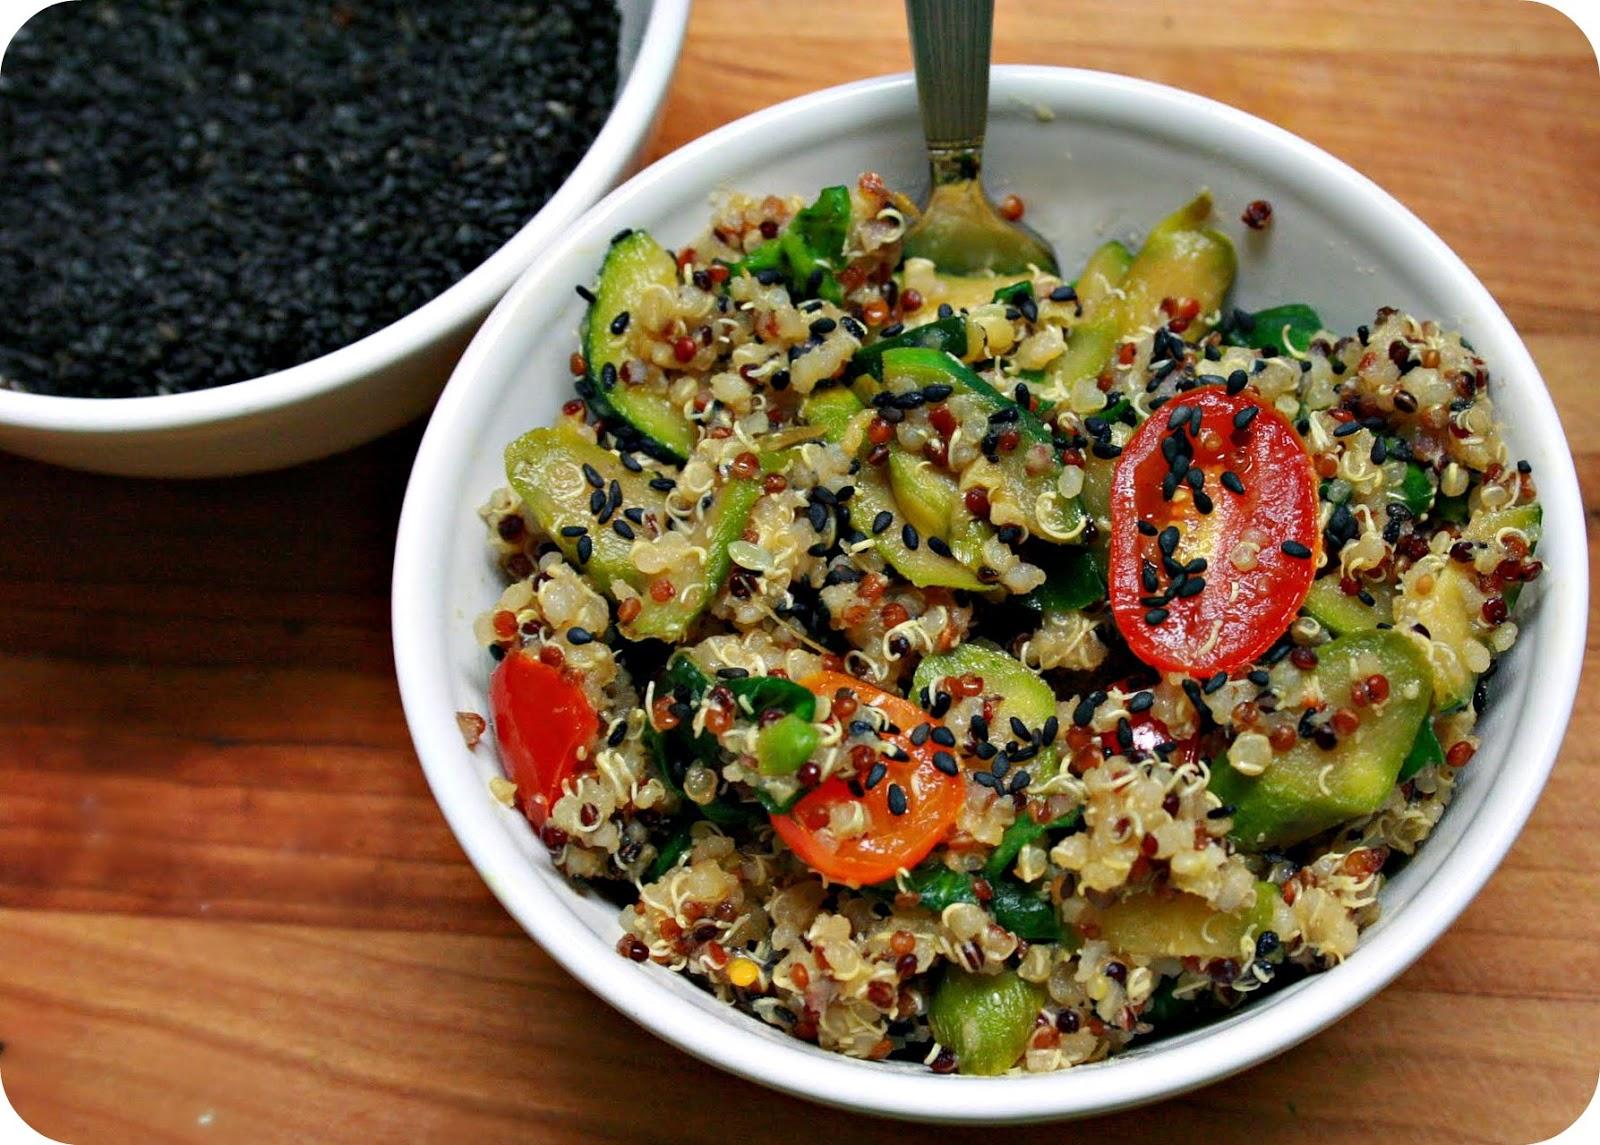 Grubarazzi: Sesame Quinoa Salad with Stir Fried Vegetables